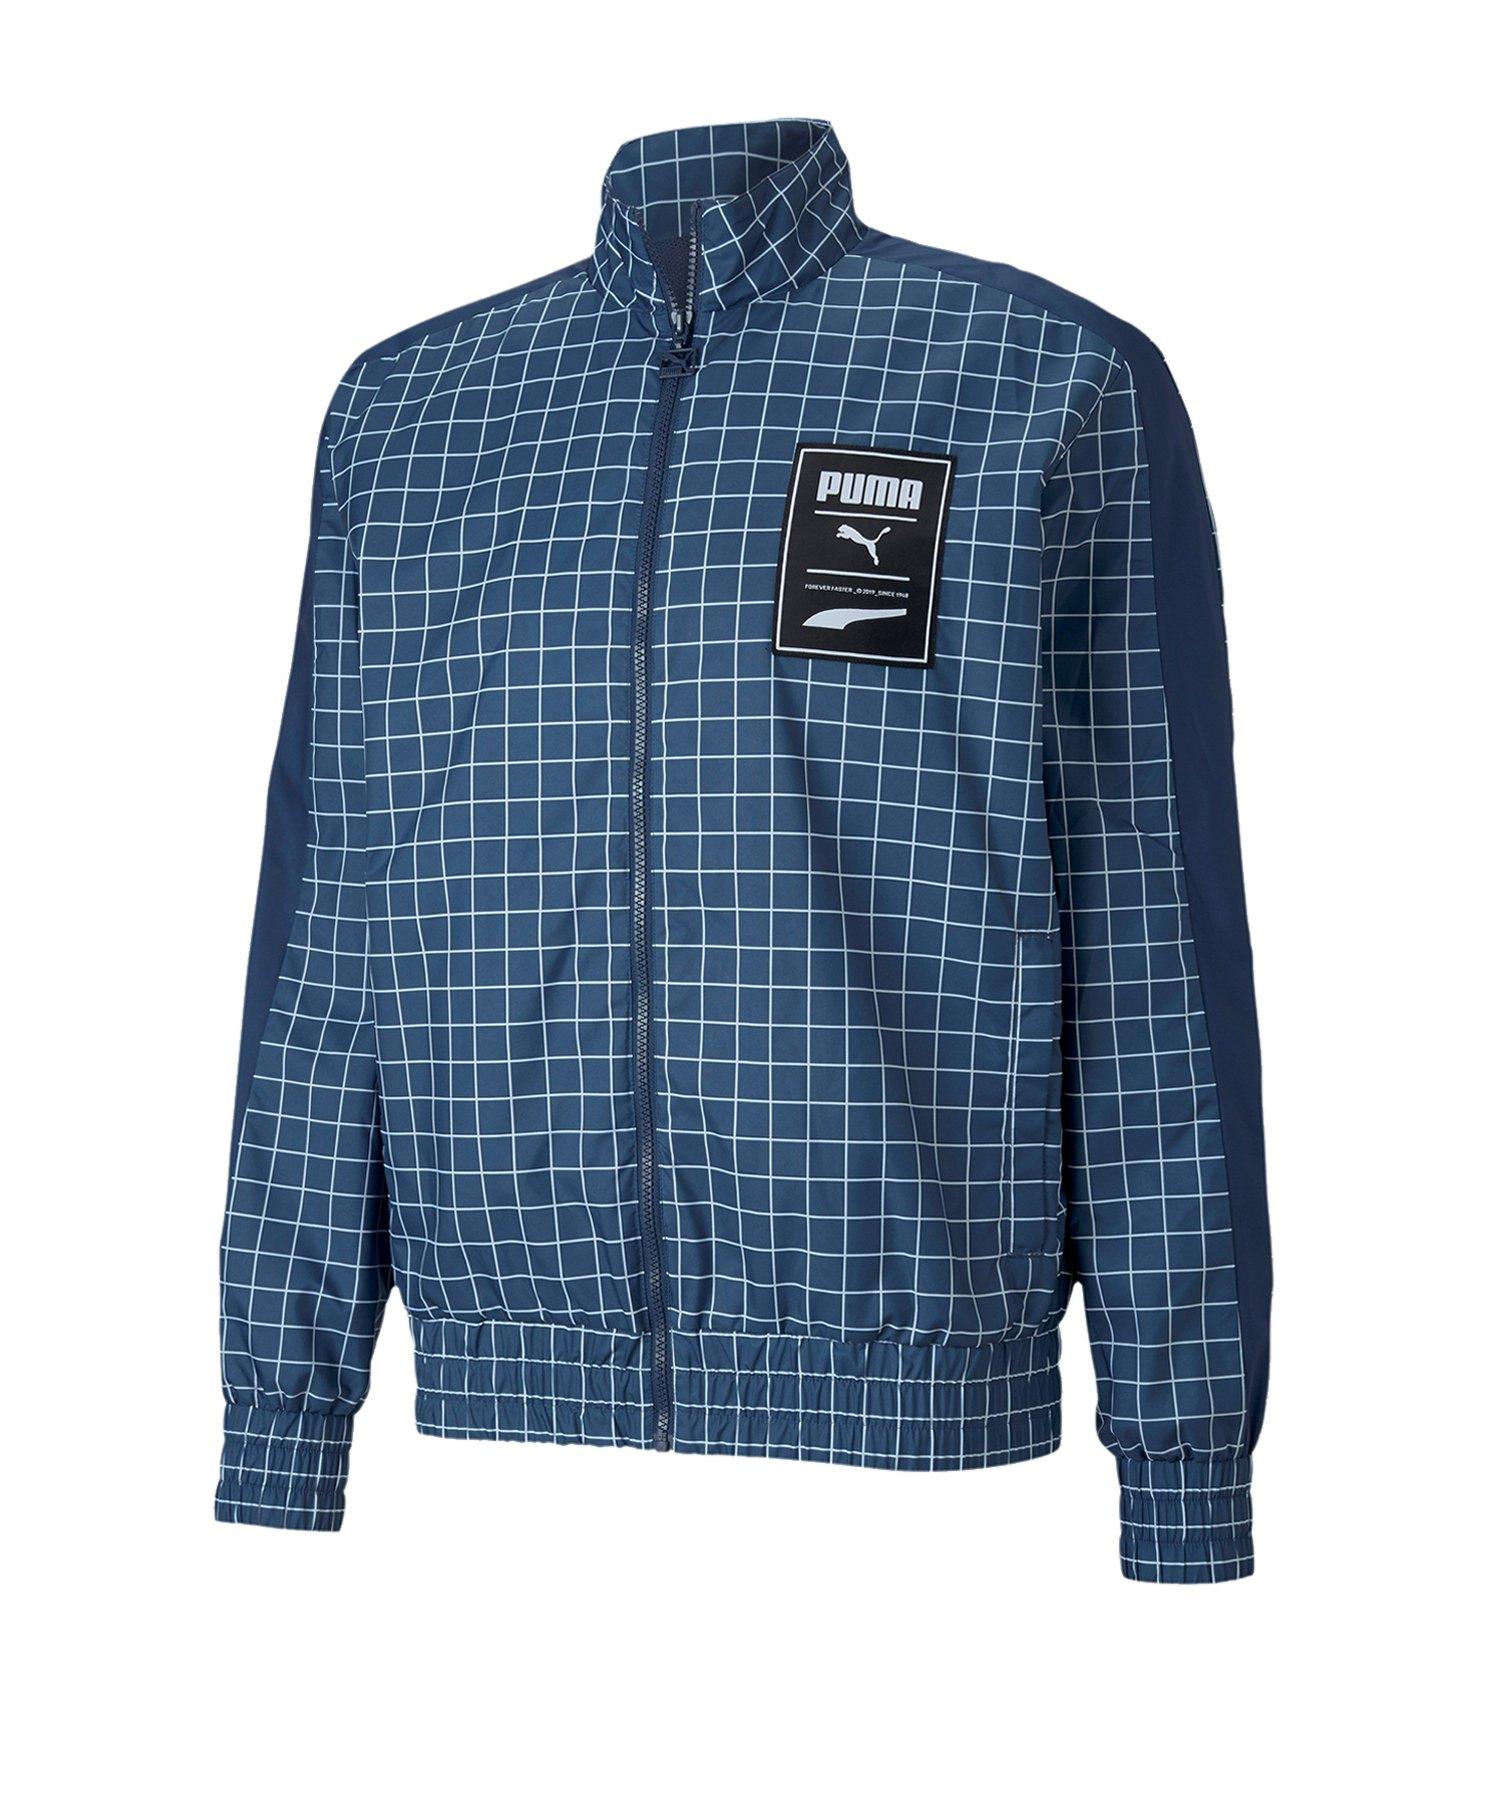 PUMA Recheck Pack Woven Jacke Blau F43 - blau